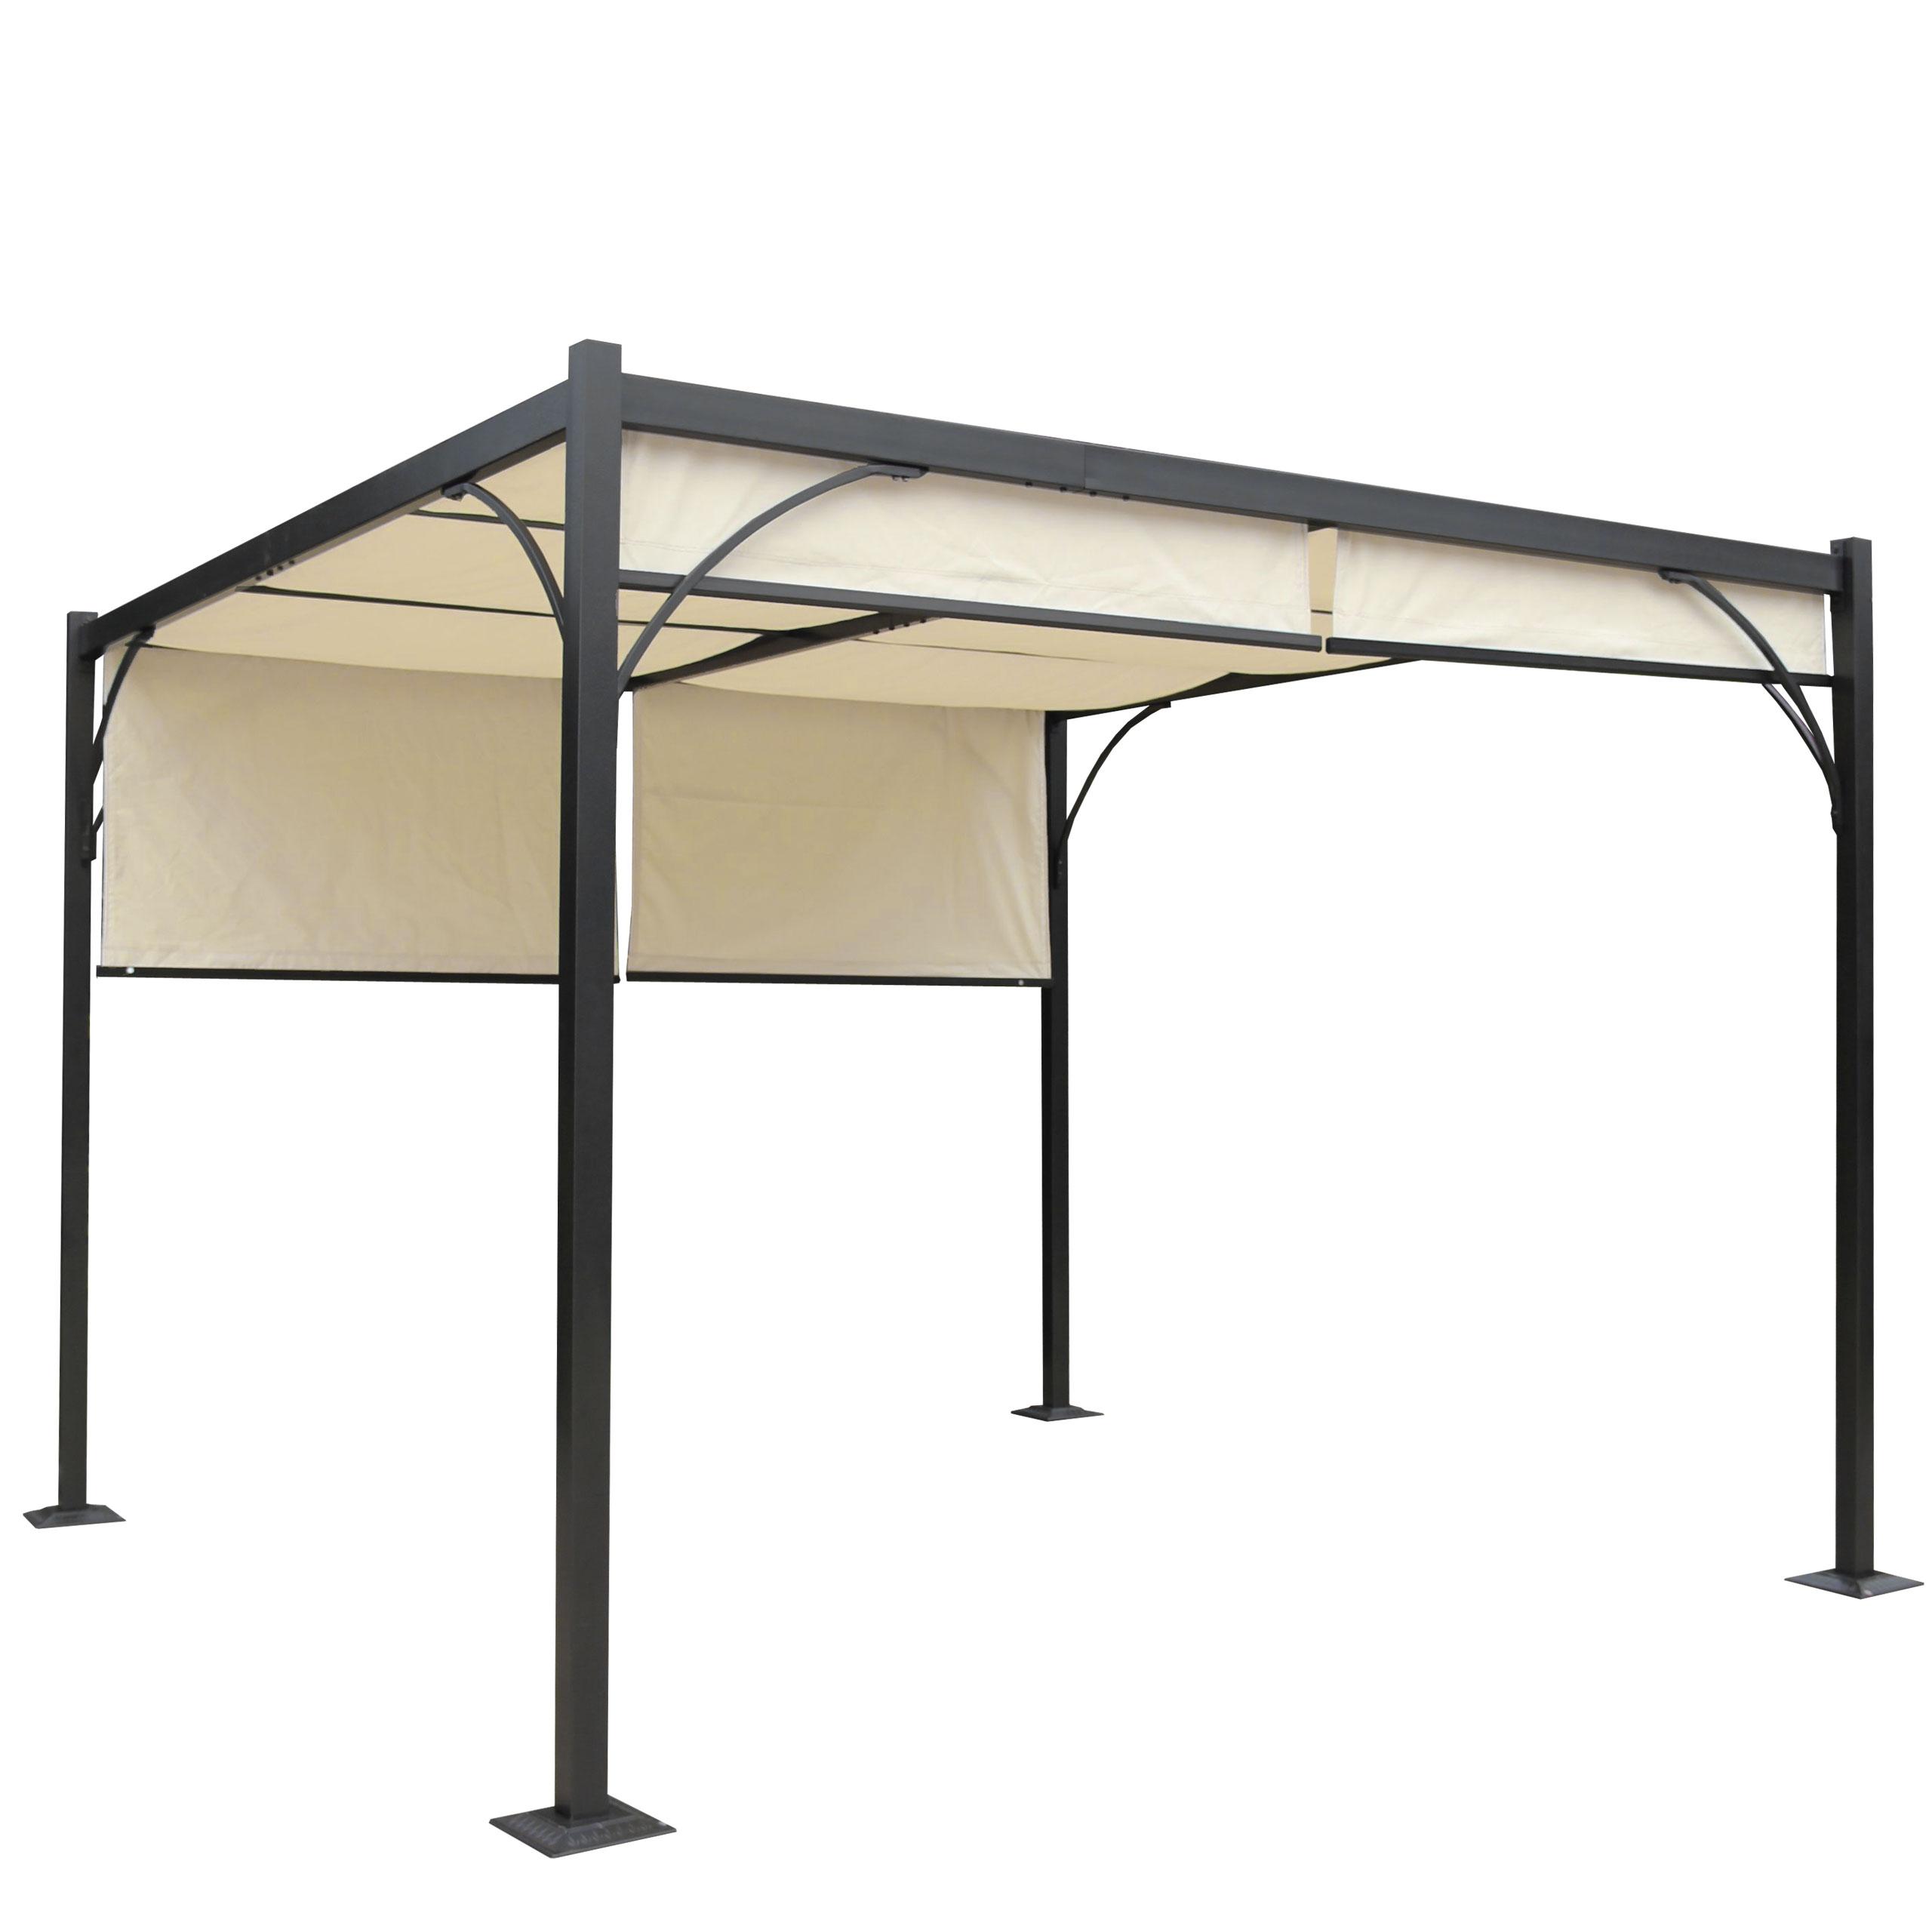 pergola baena garten pavillon stabiles 6cm alu gestell schiebedach 3x3m ebay. Black Bedroom Furniture Sets. Home Design Ideas